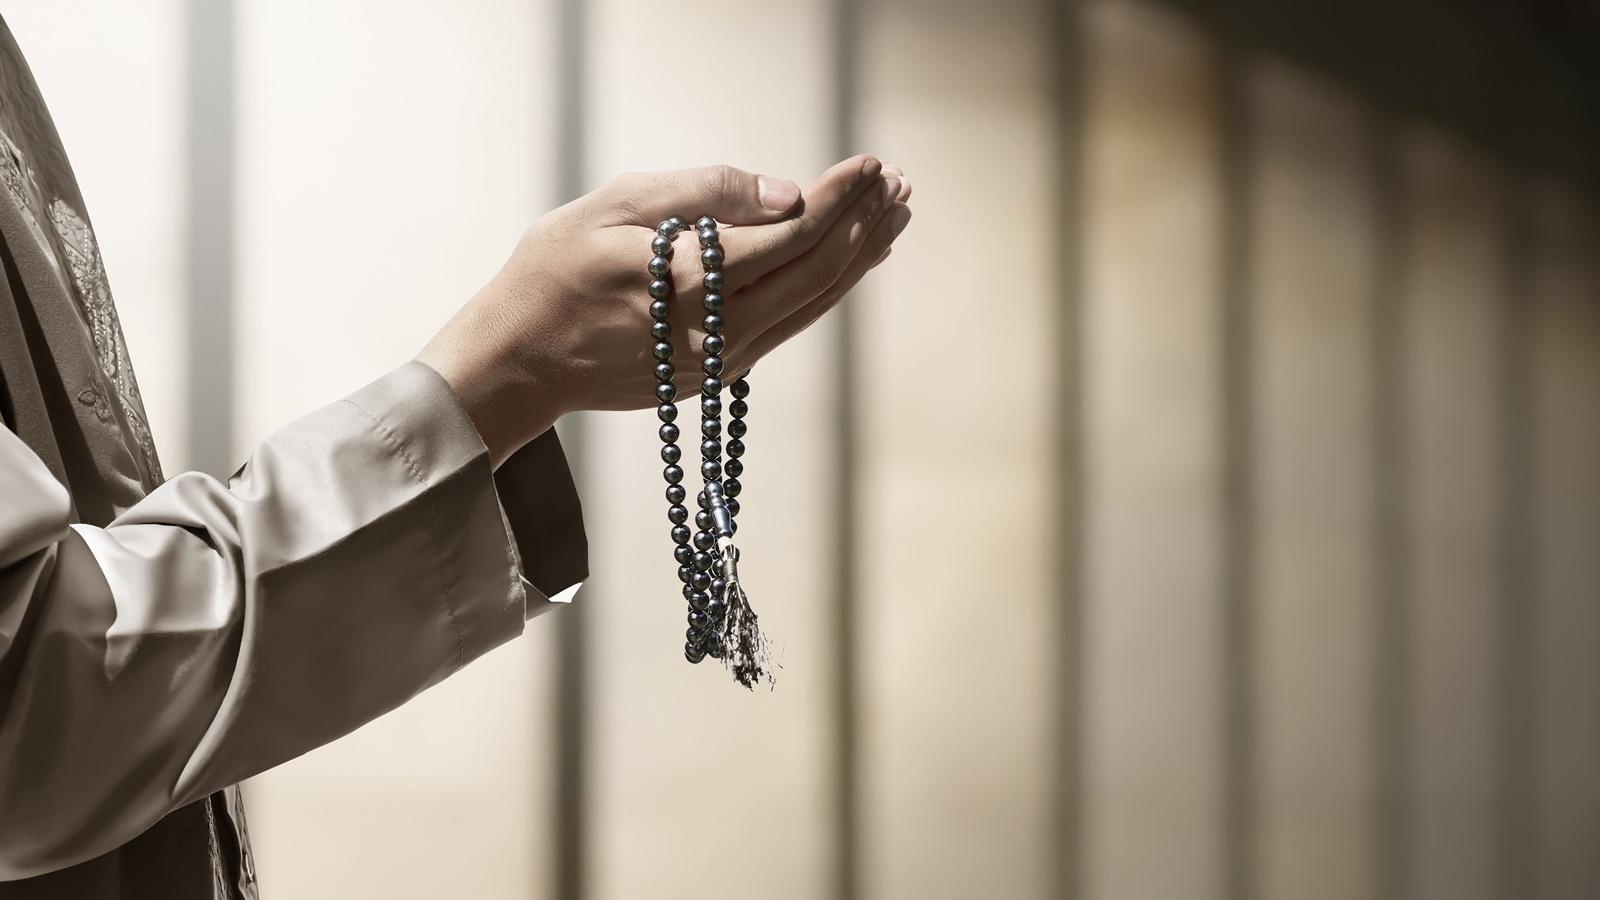 Hasil gambar untuk berdoa hd